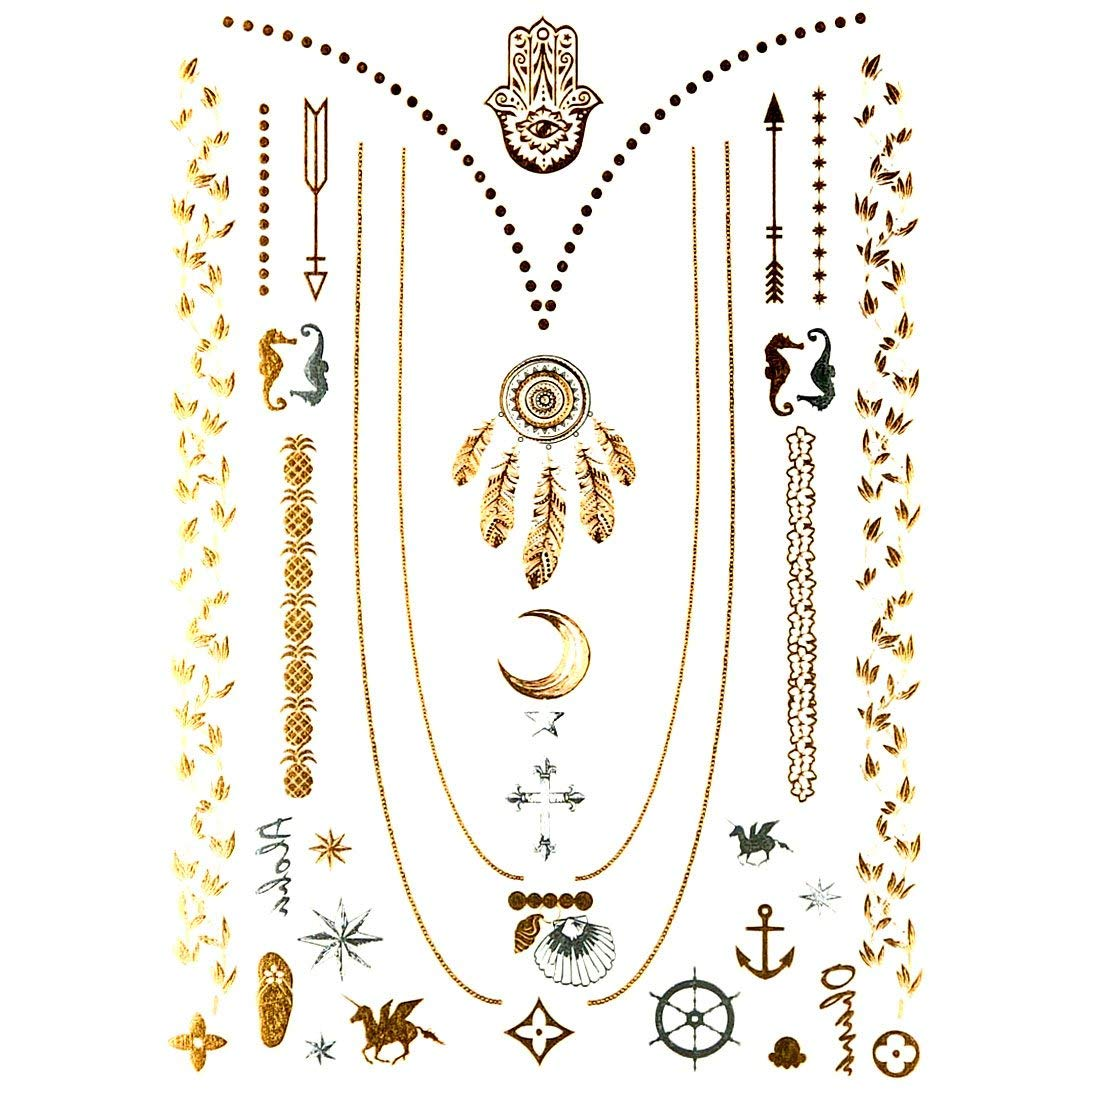 1b6d505a681e9 Get Quotations · Oottati Premium Metallic Assorted Temporary Tattoo -  Feathers Dream Catcher Cross Hand Necklace Hamsa Hand (